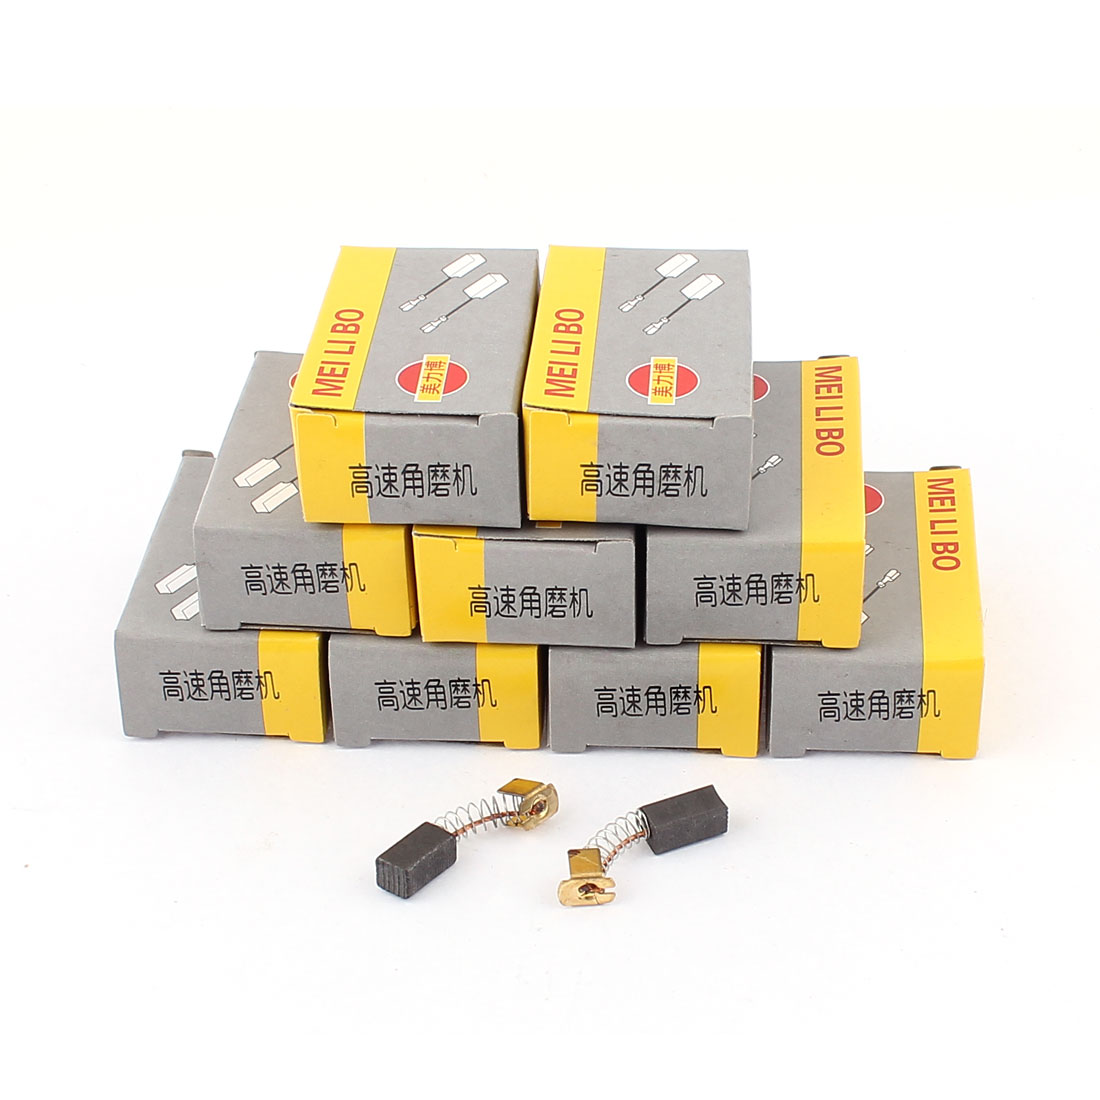 6mm x 6.5mm x 12mm Universal Power Tool Electric Drill Motor Carbon Brush 20 Pcs